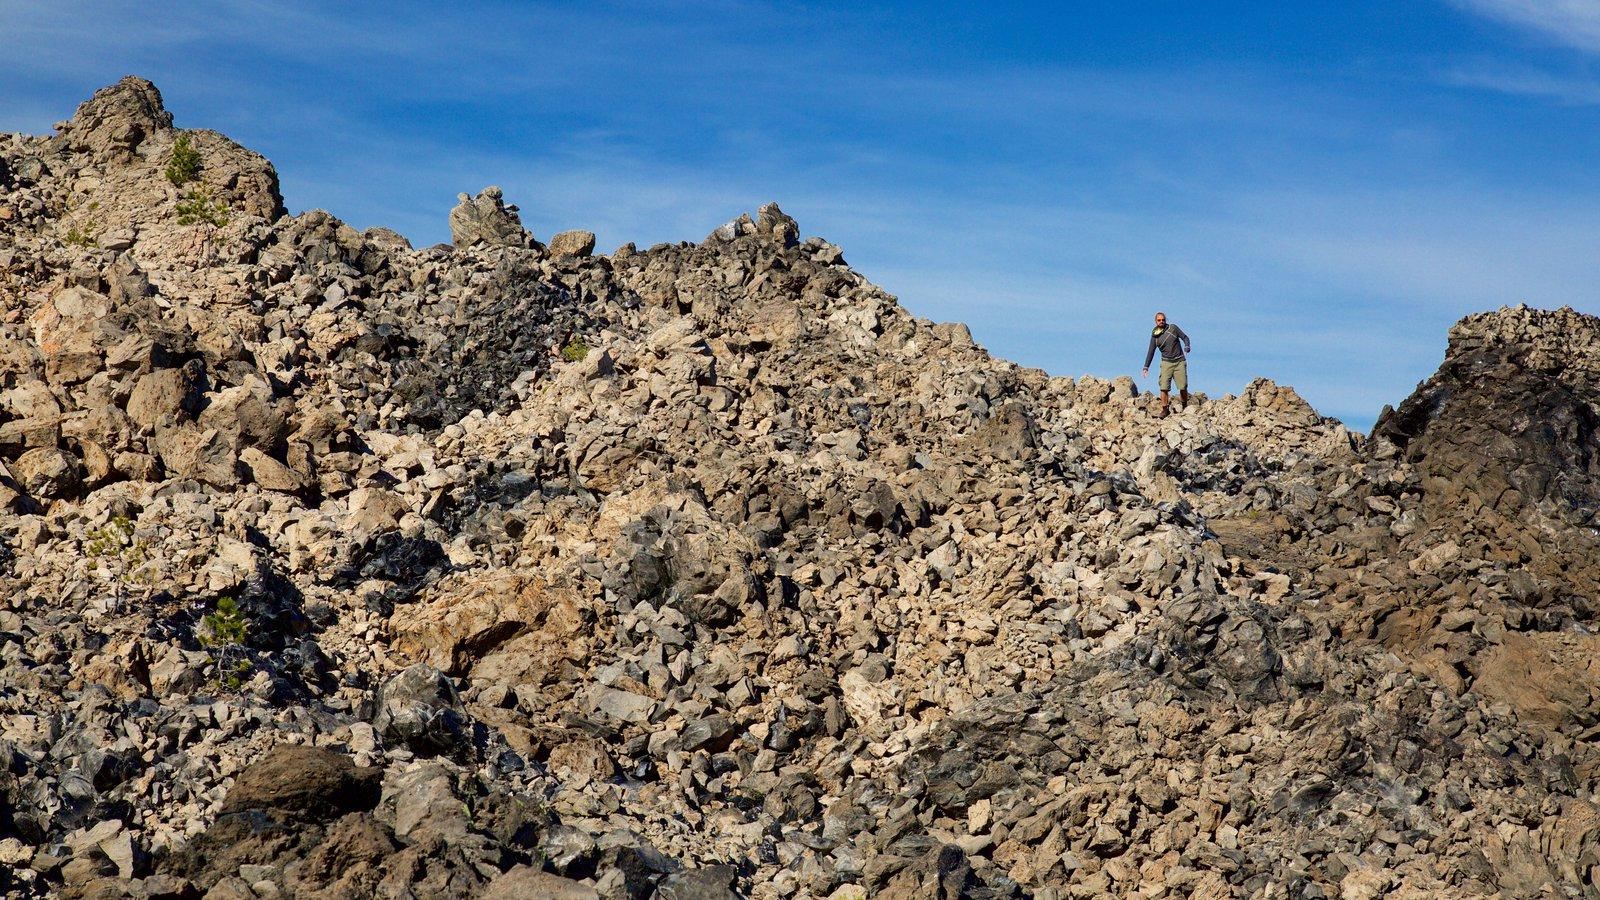 Newberry National Volcanic Monument ofreciendo montañas y escenas tranquilas